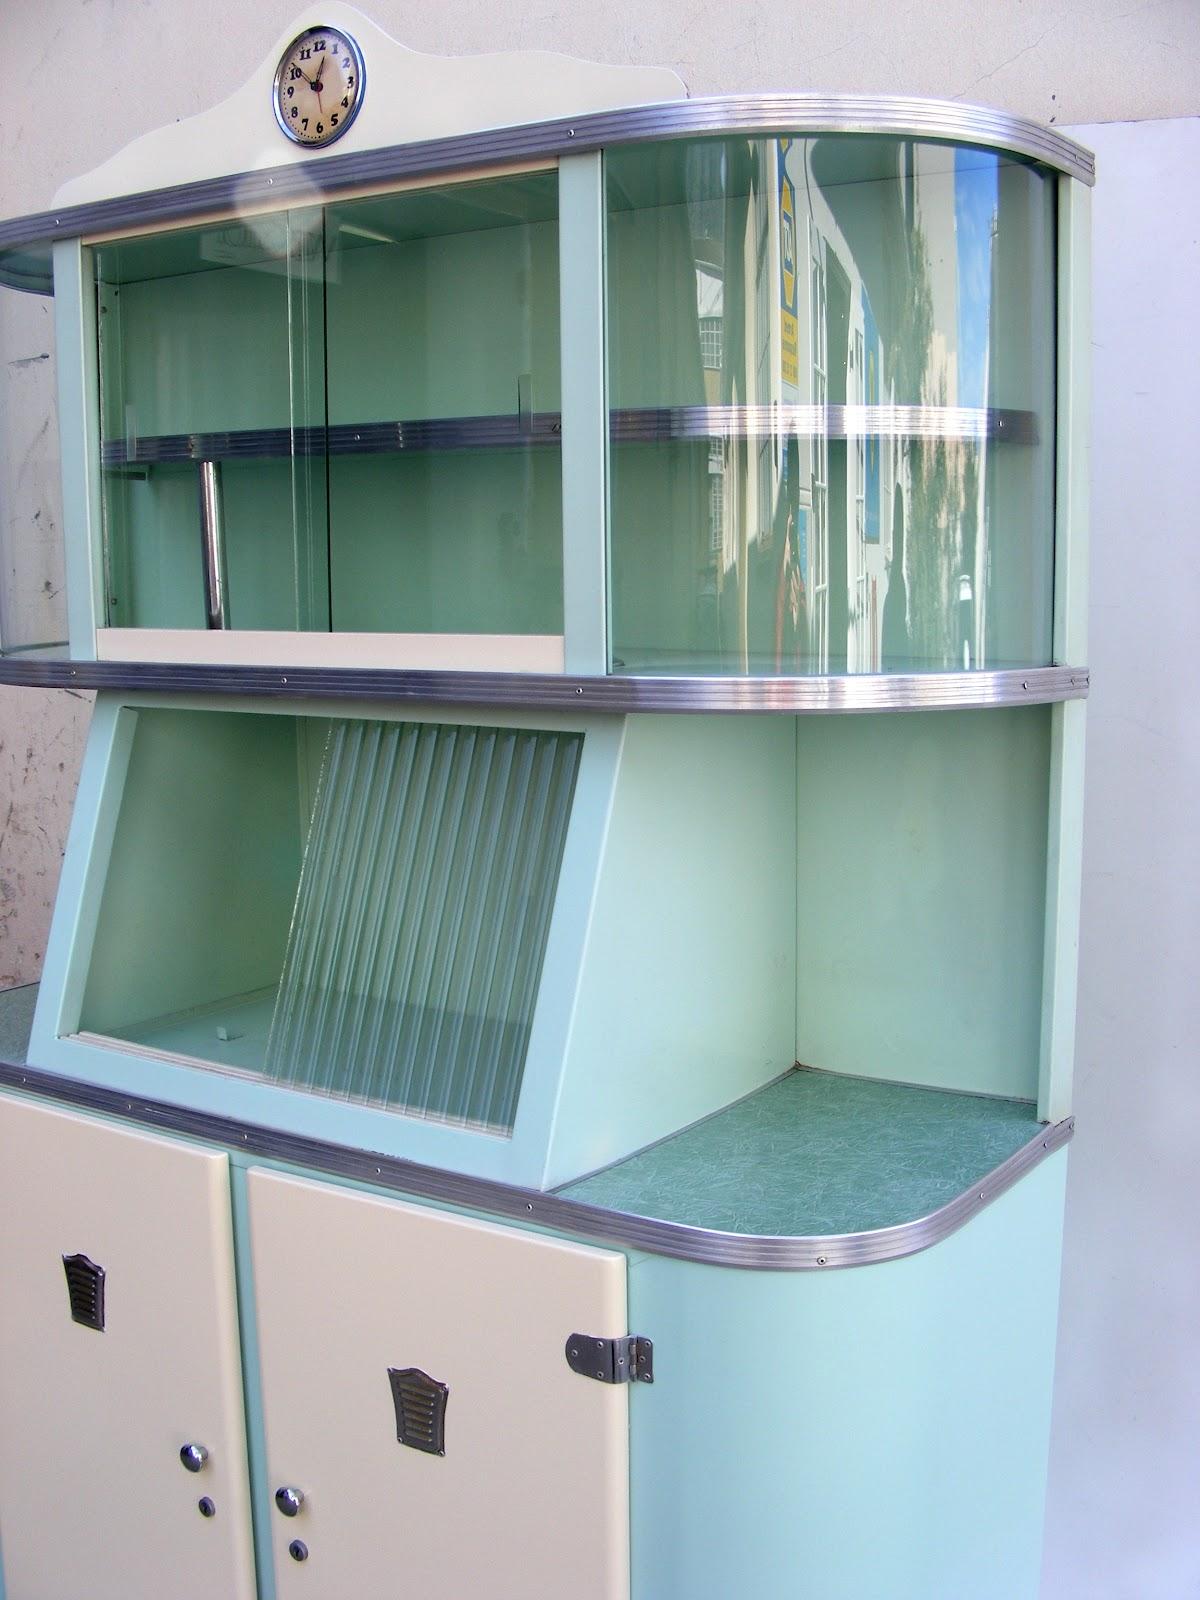 VAMP FURNITURE New furniture stock this week at Vamp  10 August 2012